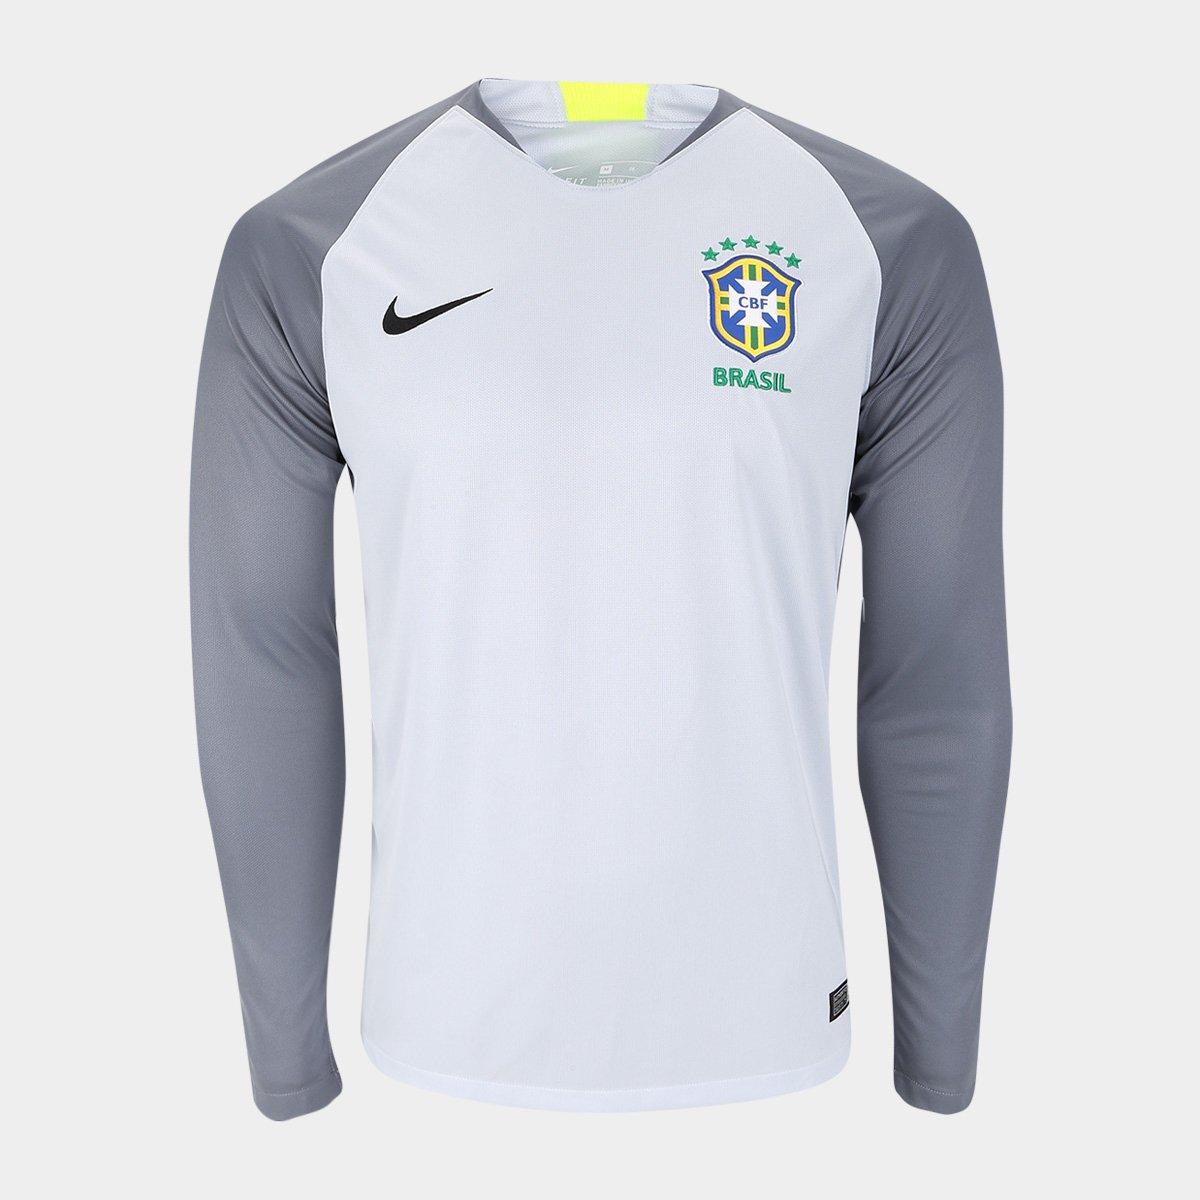 266909f342 Camisa Seleção Brasil Goleiro 2018 s n° Torcedor Nike Masculina ...